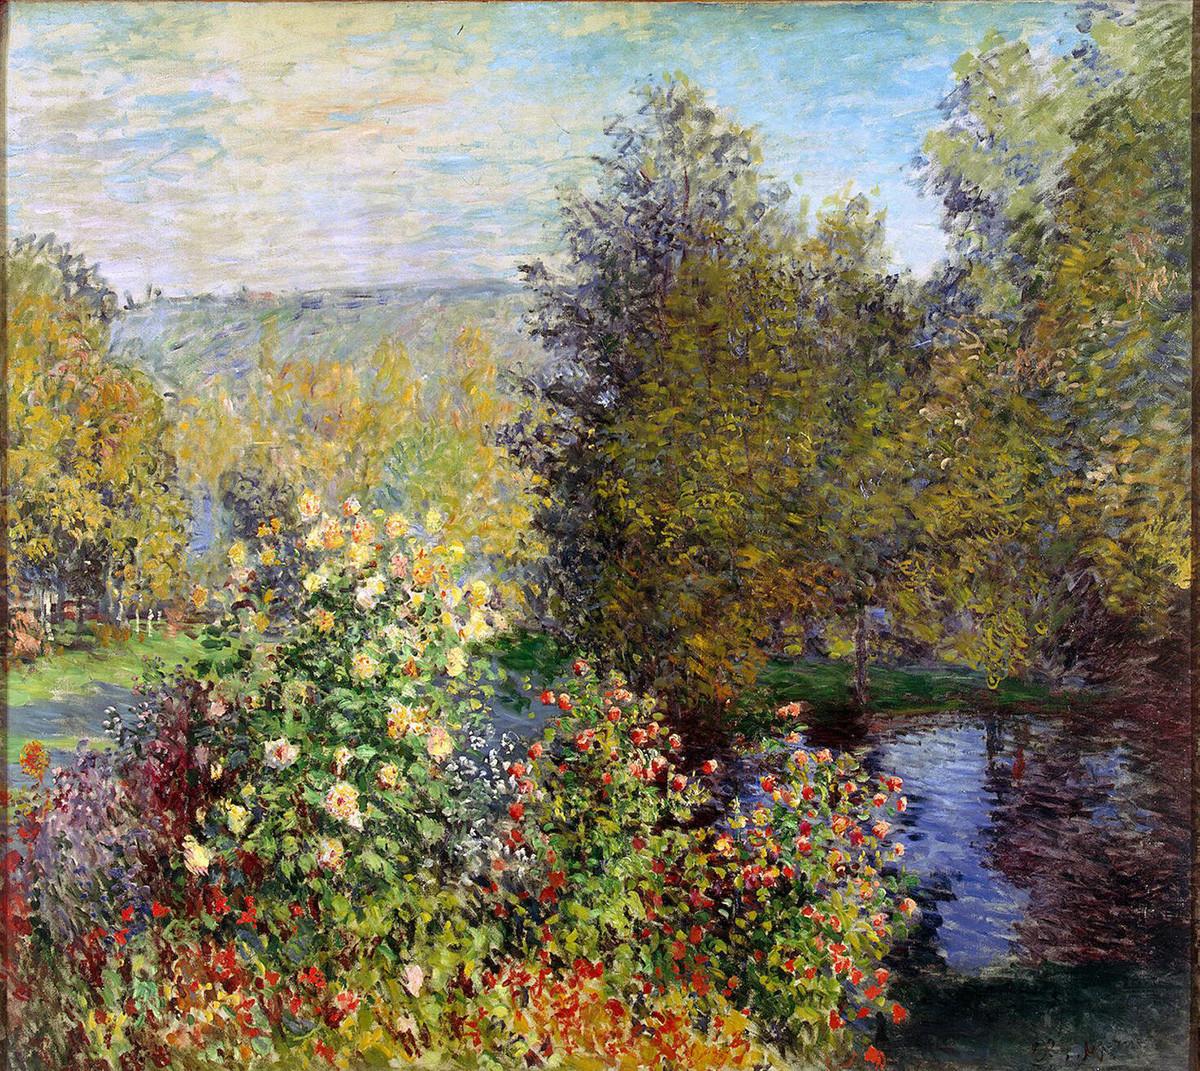 Angolo del giardino di Montgeron, Claude Monet